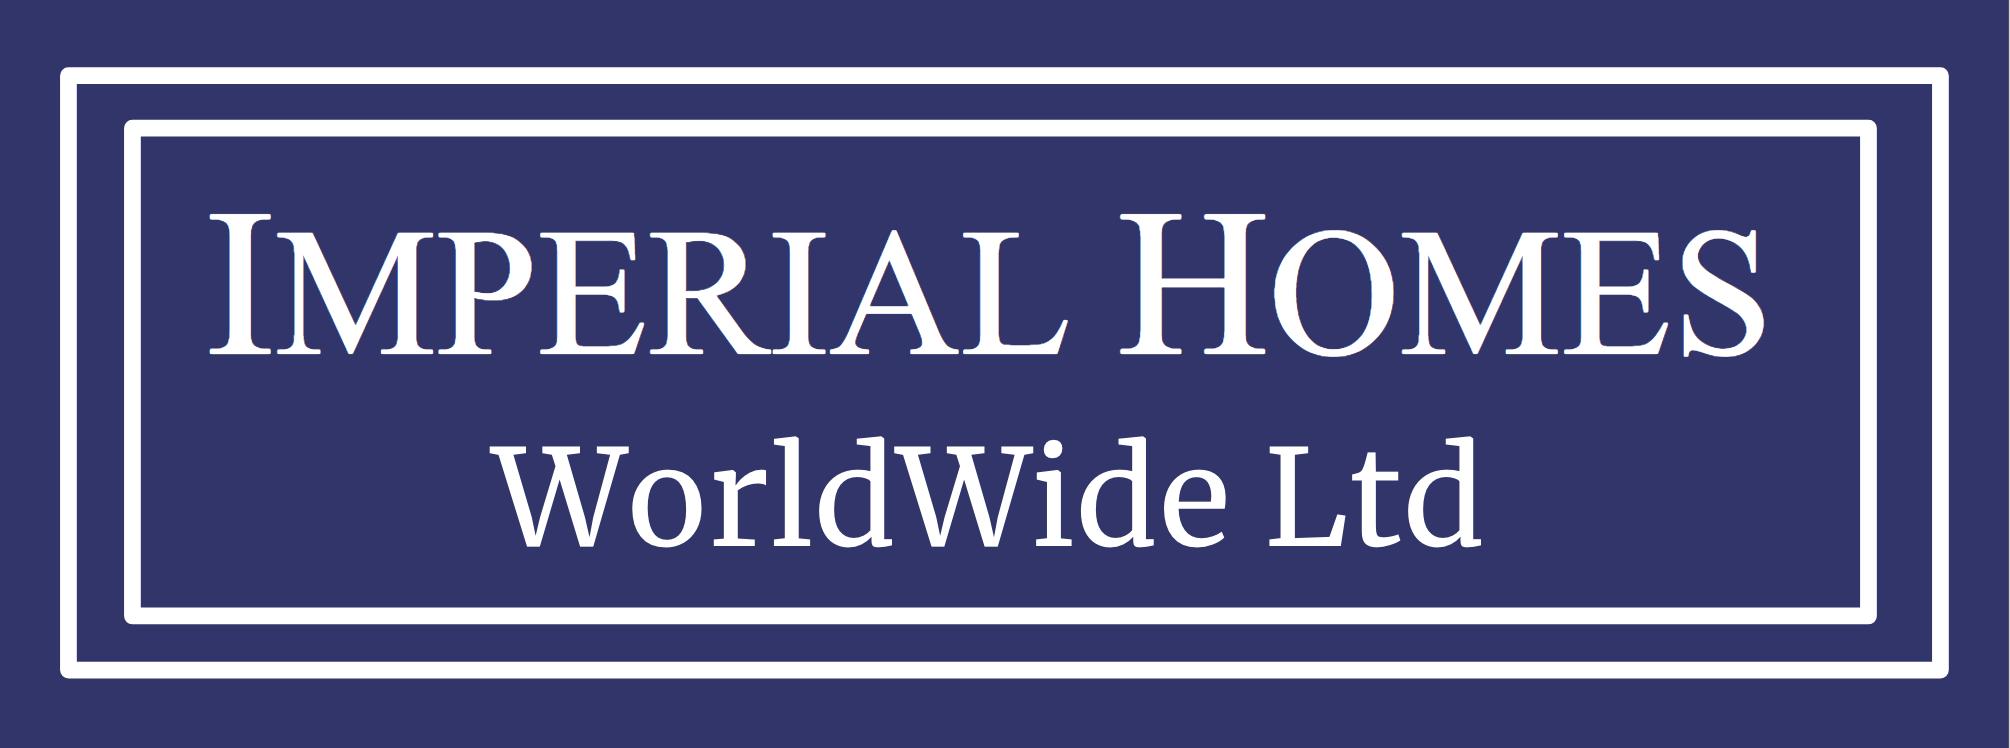 Imperial Homes WorldWide Ltd